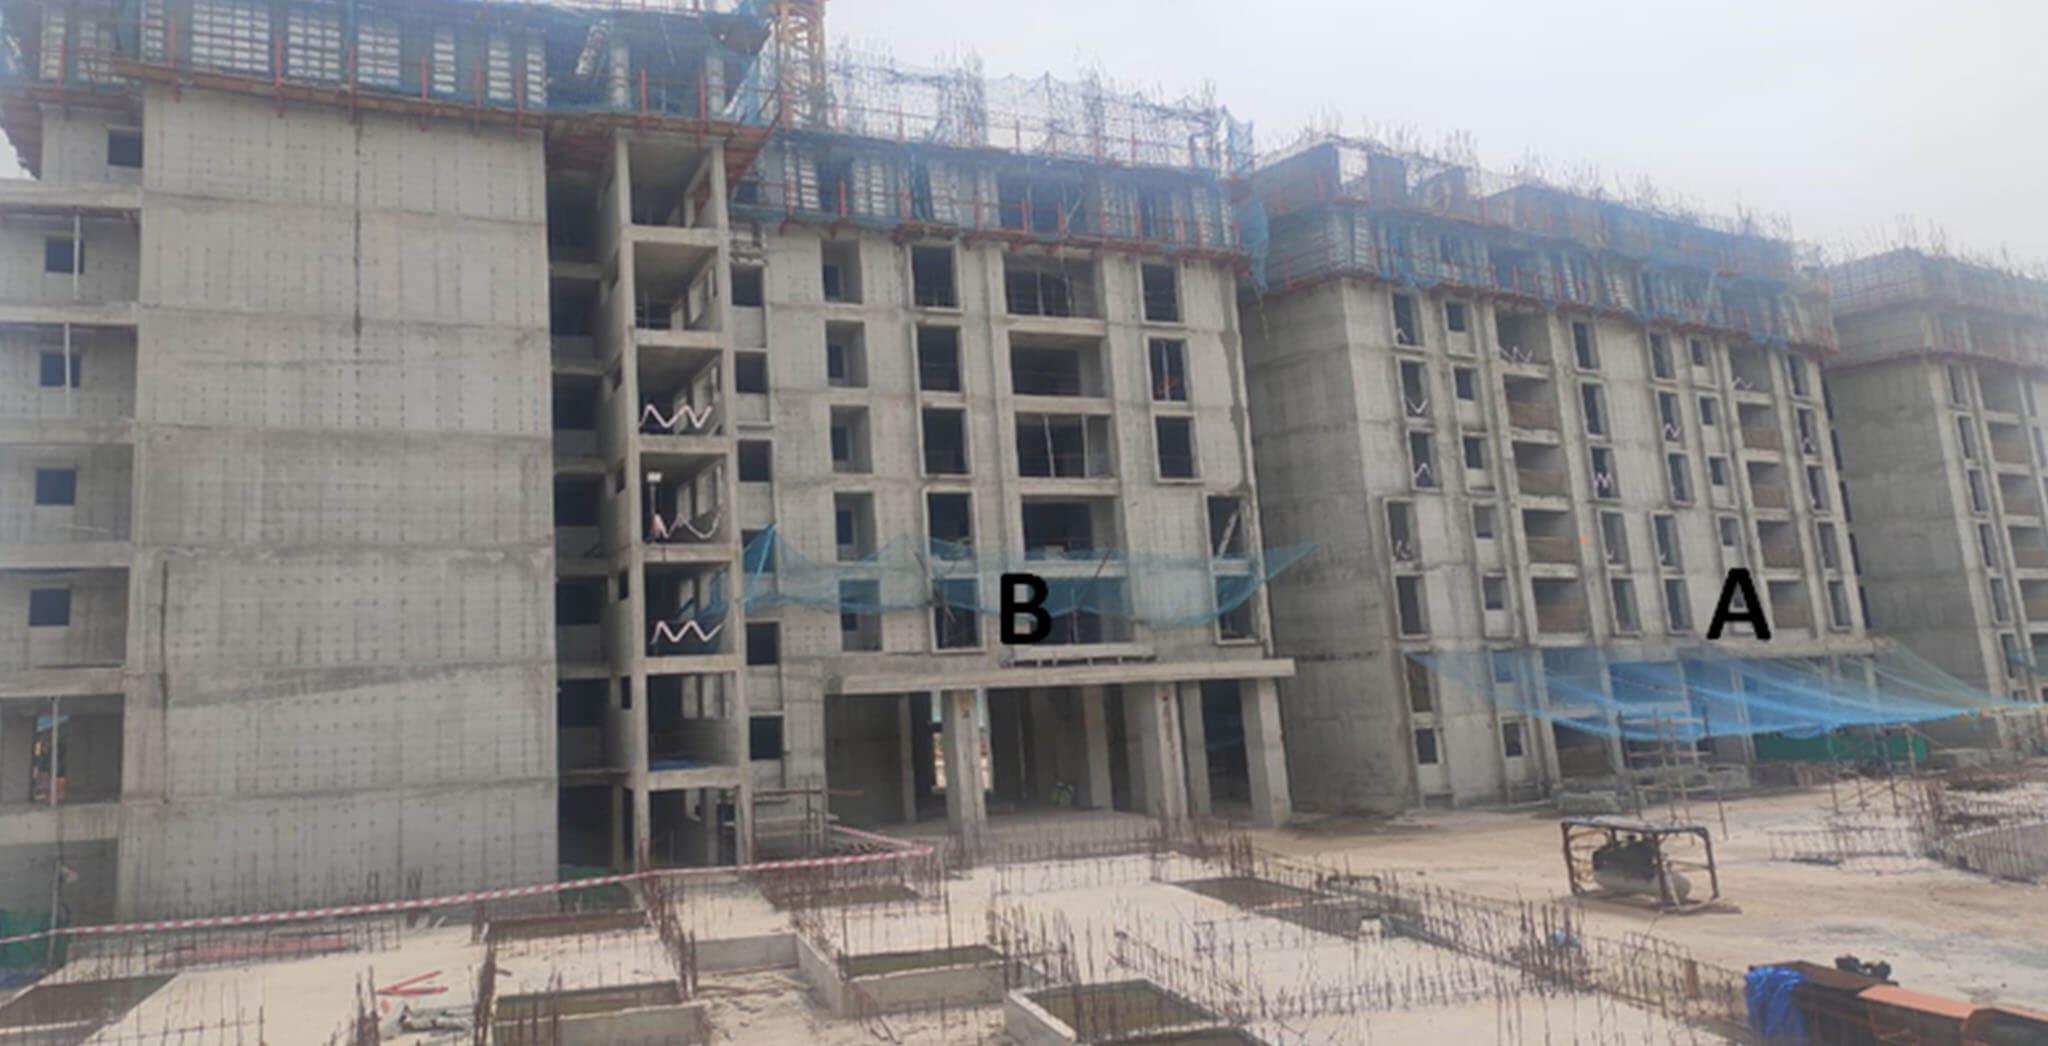 Jul 2020 - Serene: Tower A—9th floor slab in progress & Tower B—8th floor slab completed.